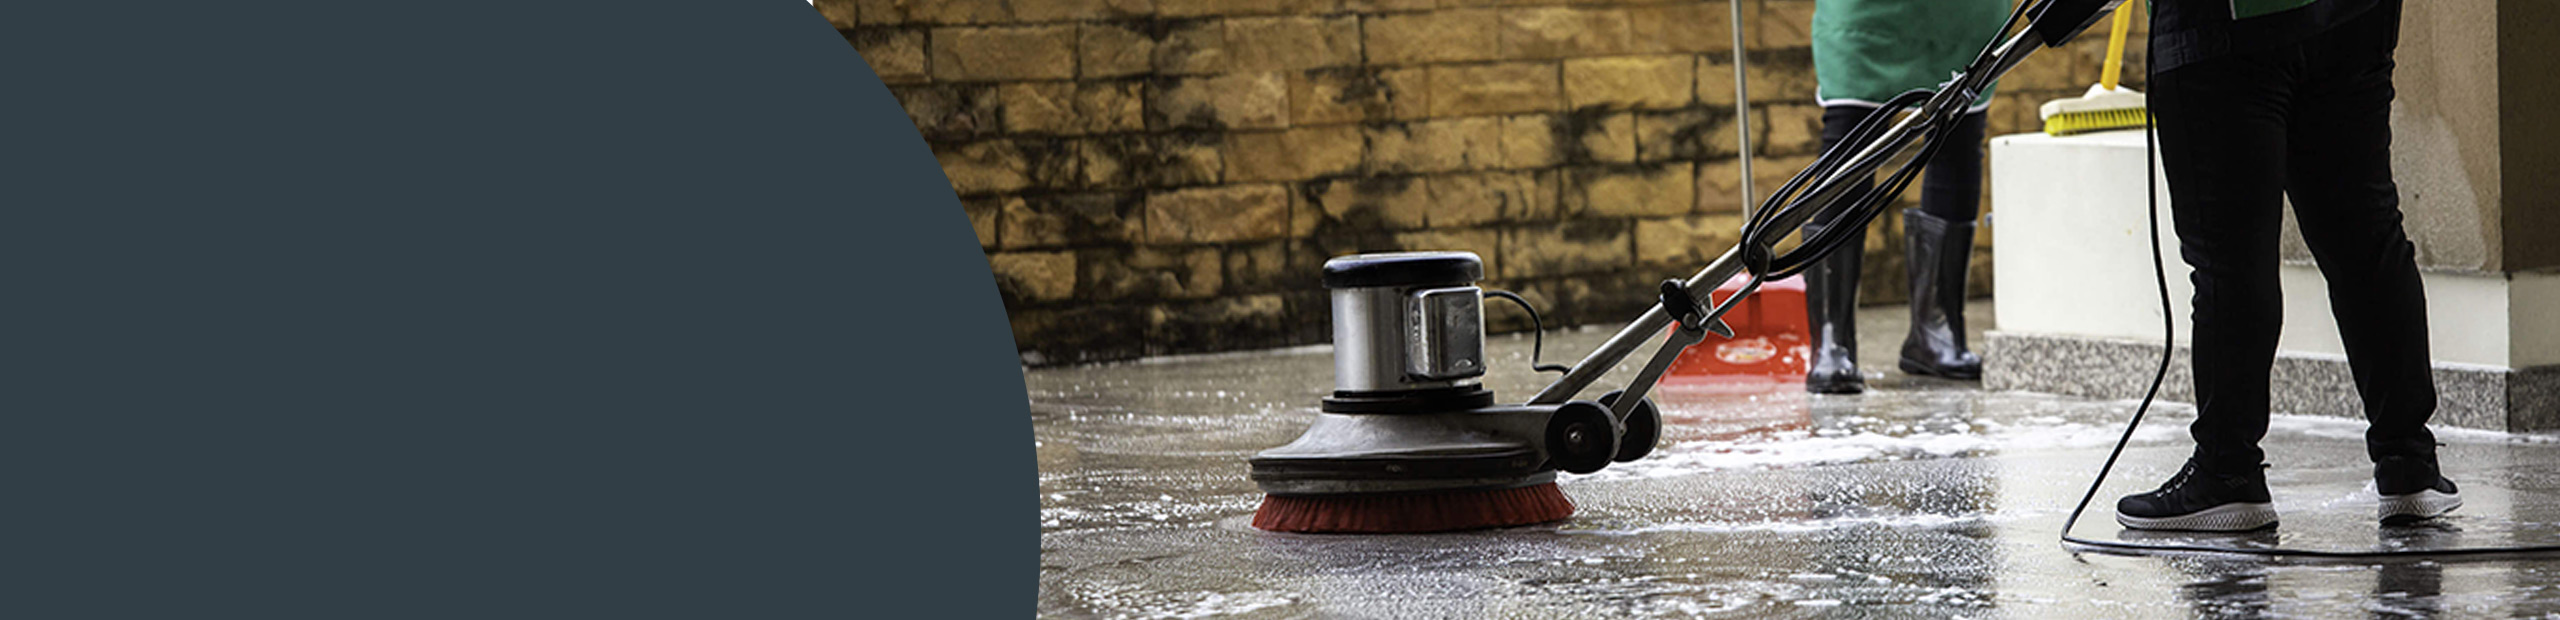 Industrial Floor Cleaning London